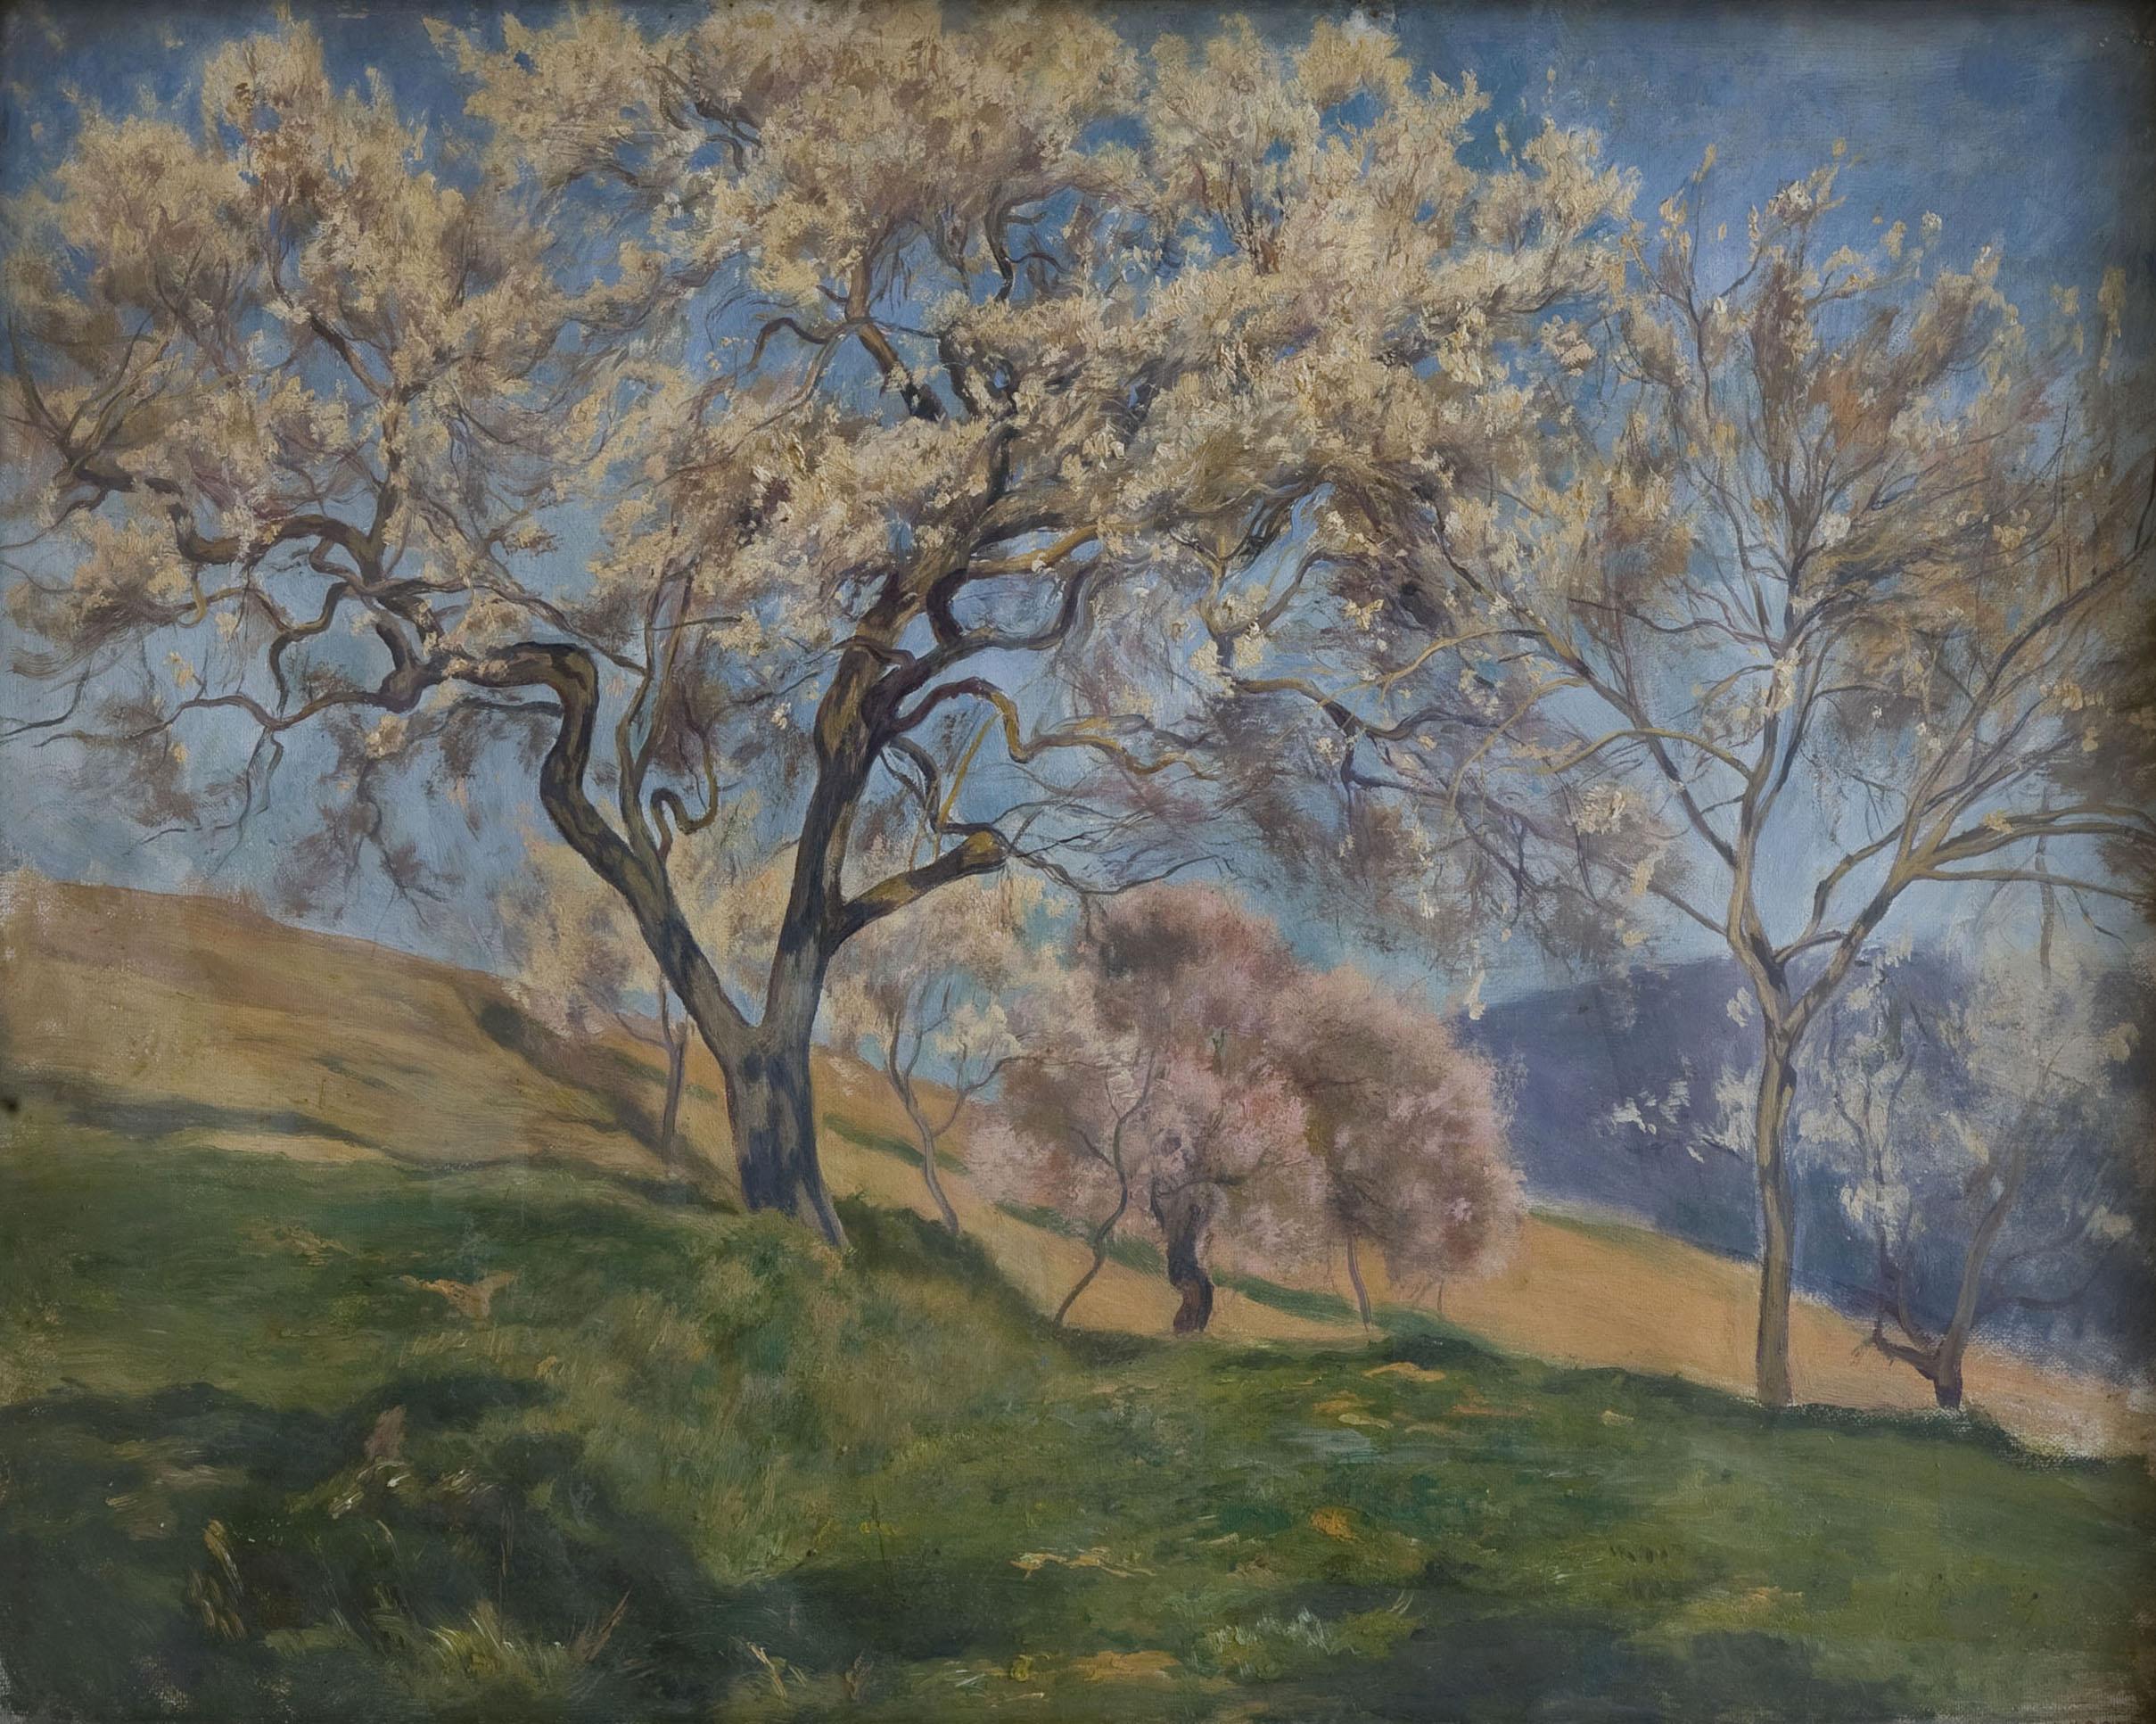 Enric Galwey - Primavera - Cap a 1907